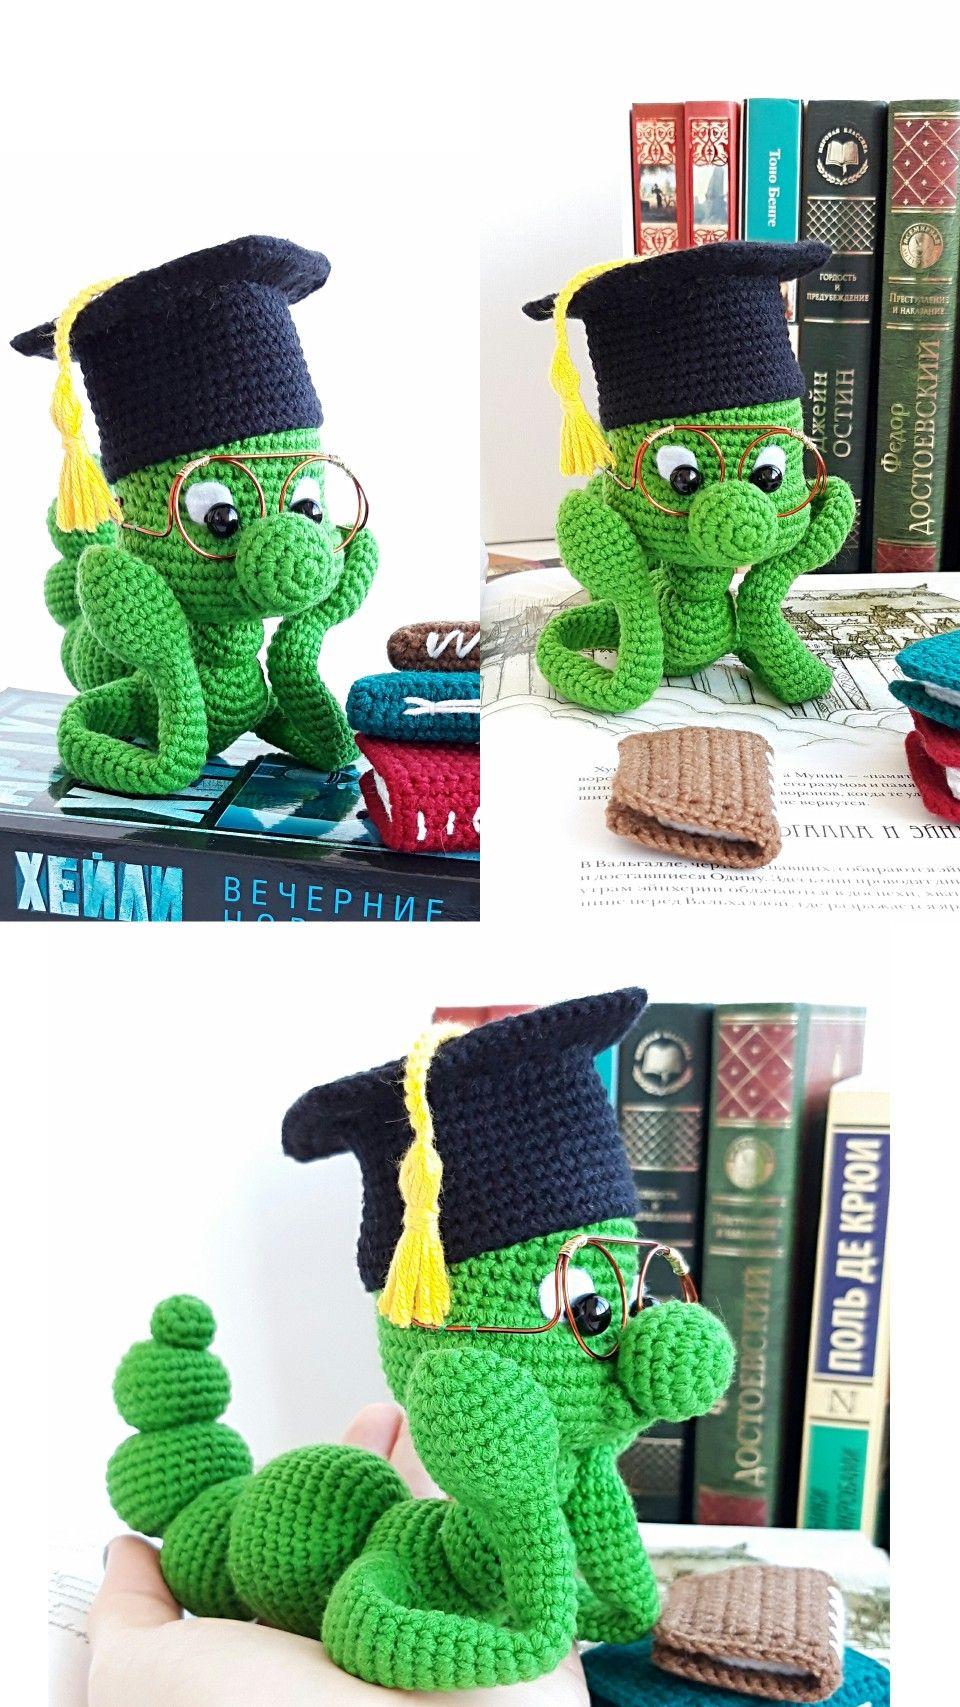 Bookworm,Handmade plushie, book lover gift,Stuffed Animals